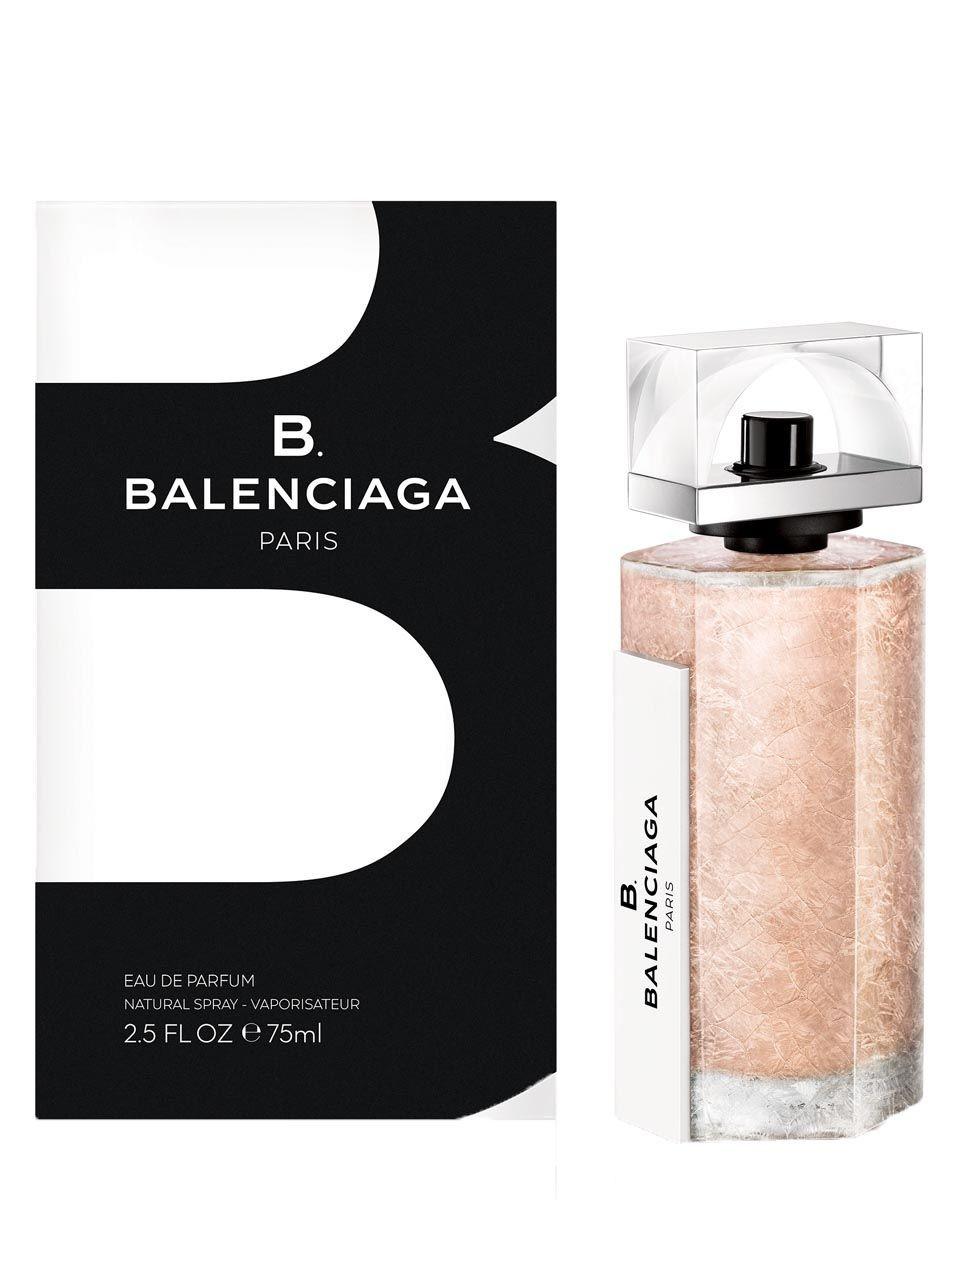 B Balenciaga Paris